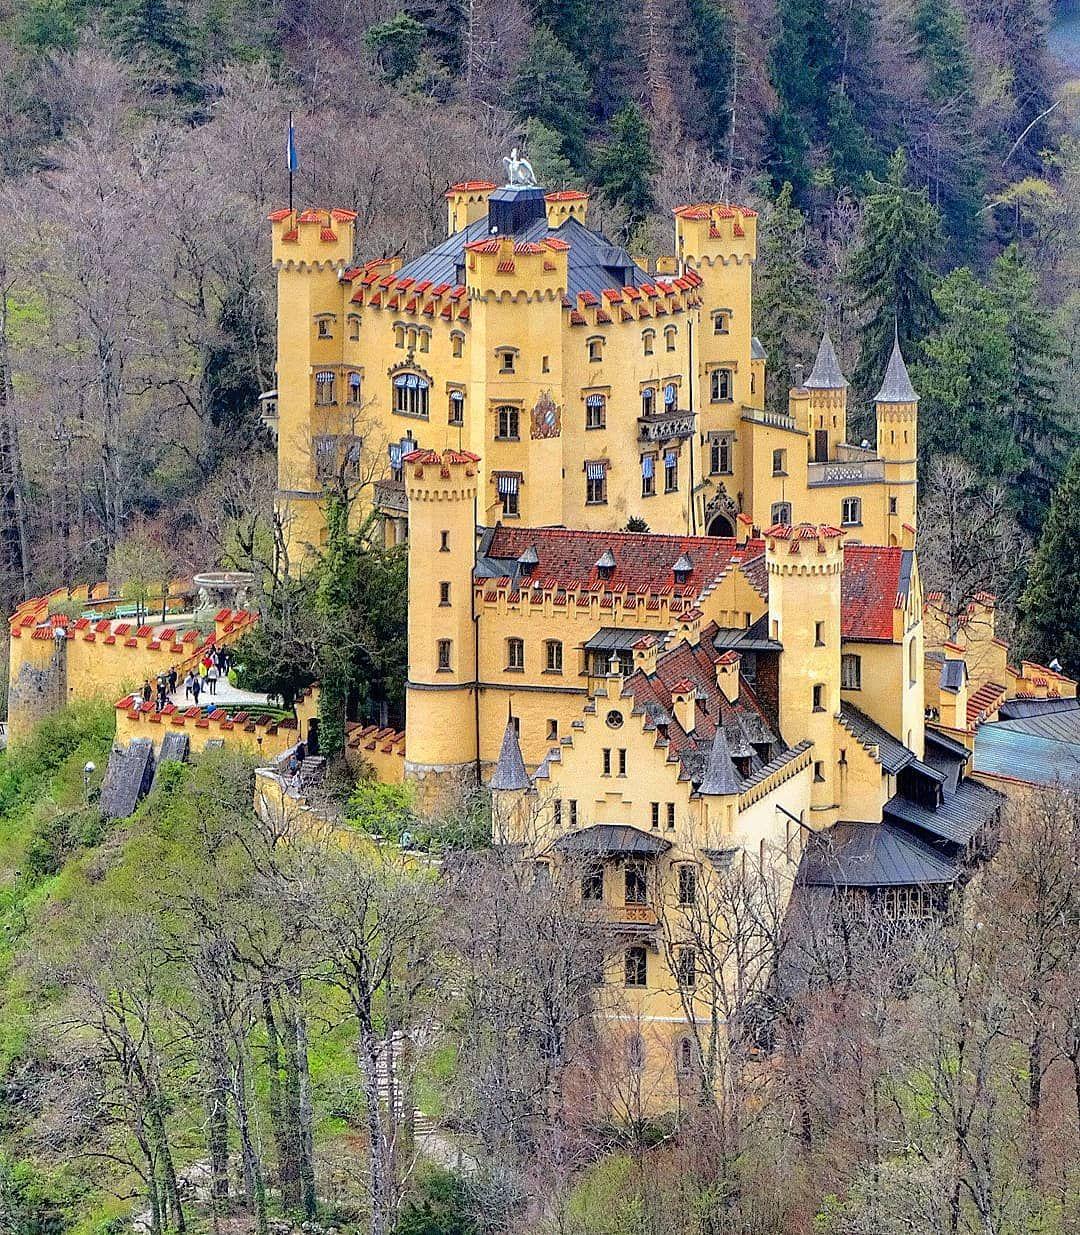 Hohenschwangau Castle Bavaria Germany Schloss Hohenschwangau Bayern Deutschland Zamok Hoenshva Castles To Visit Castle Bavaria Germany Castles